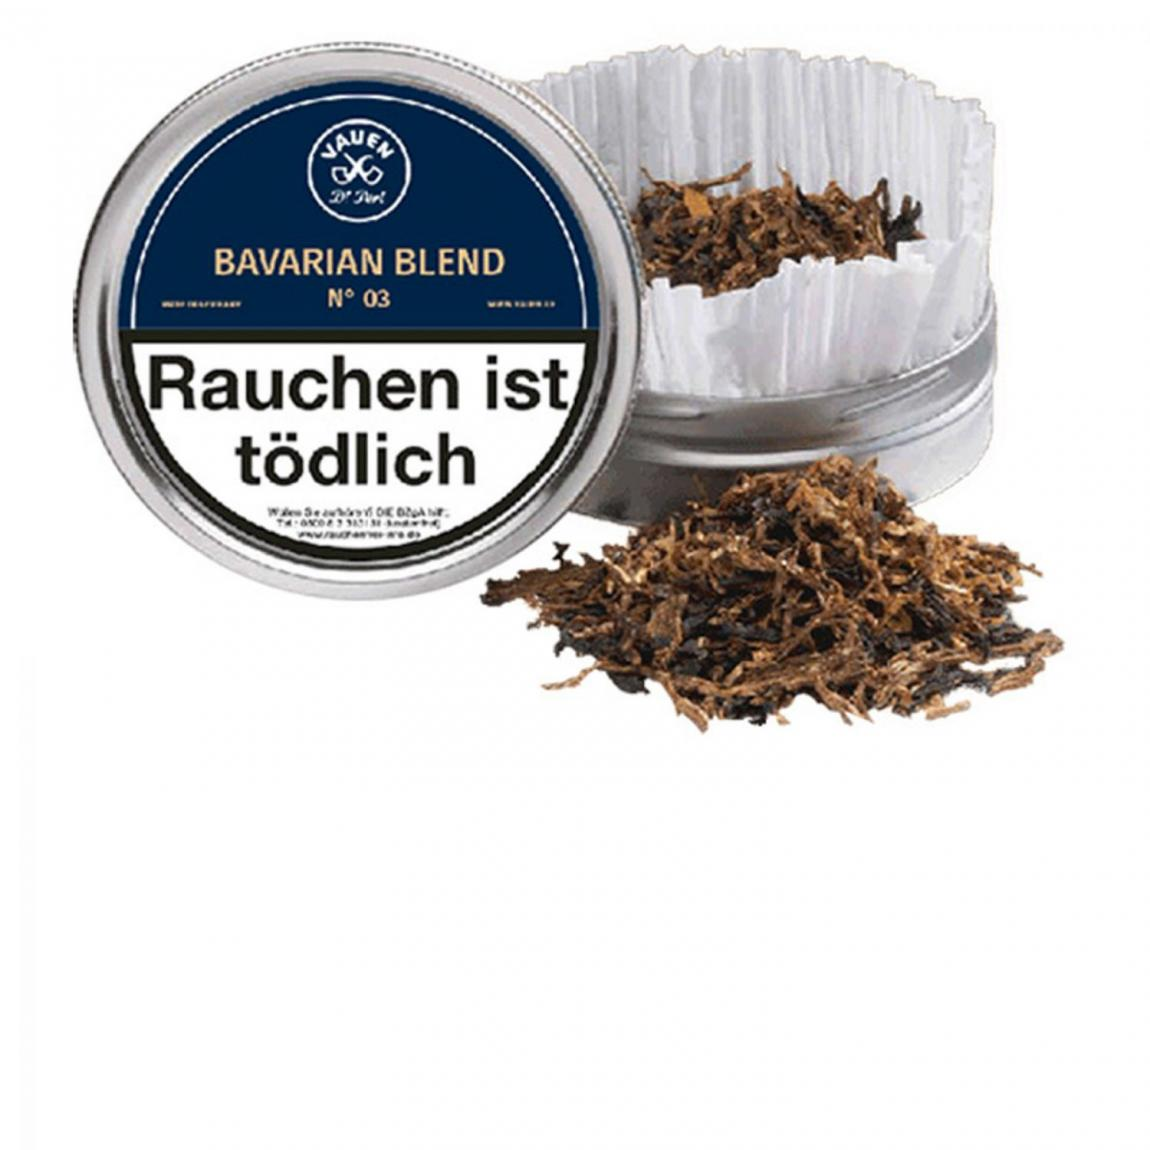 Vauen »Bavarian Blend No. 03« 50g Dose